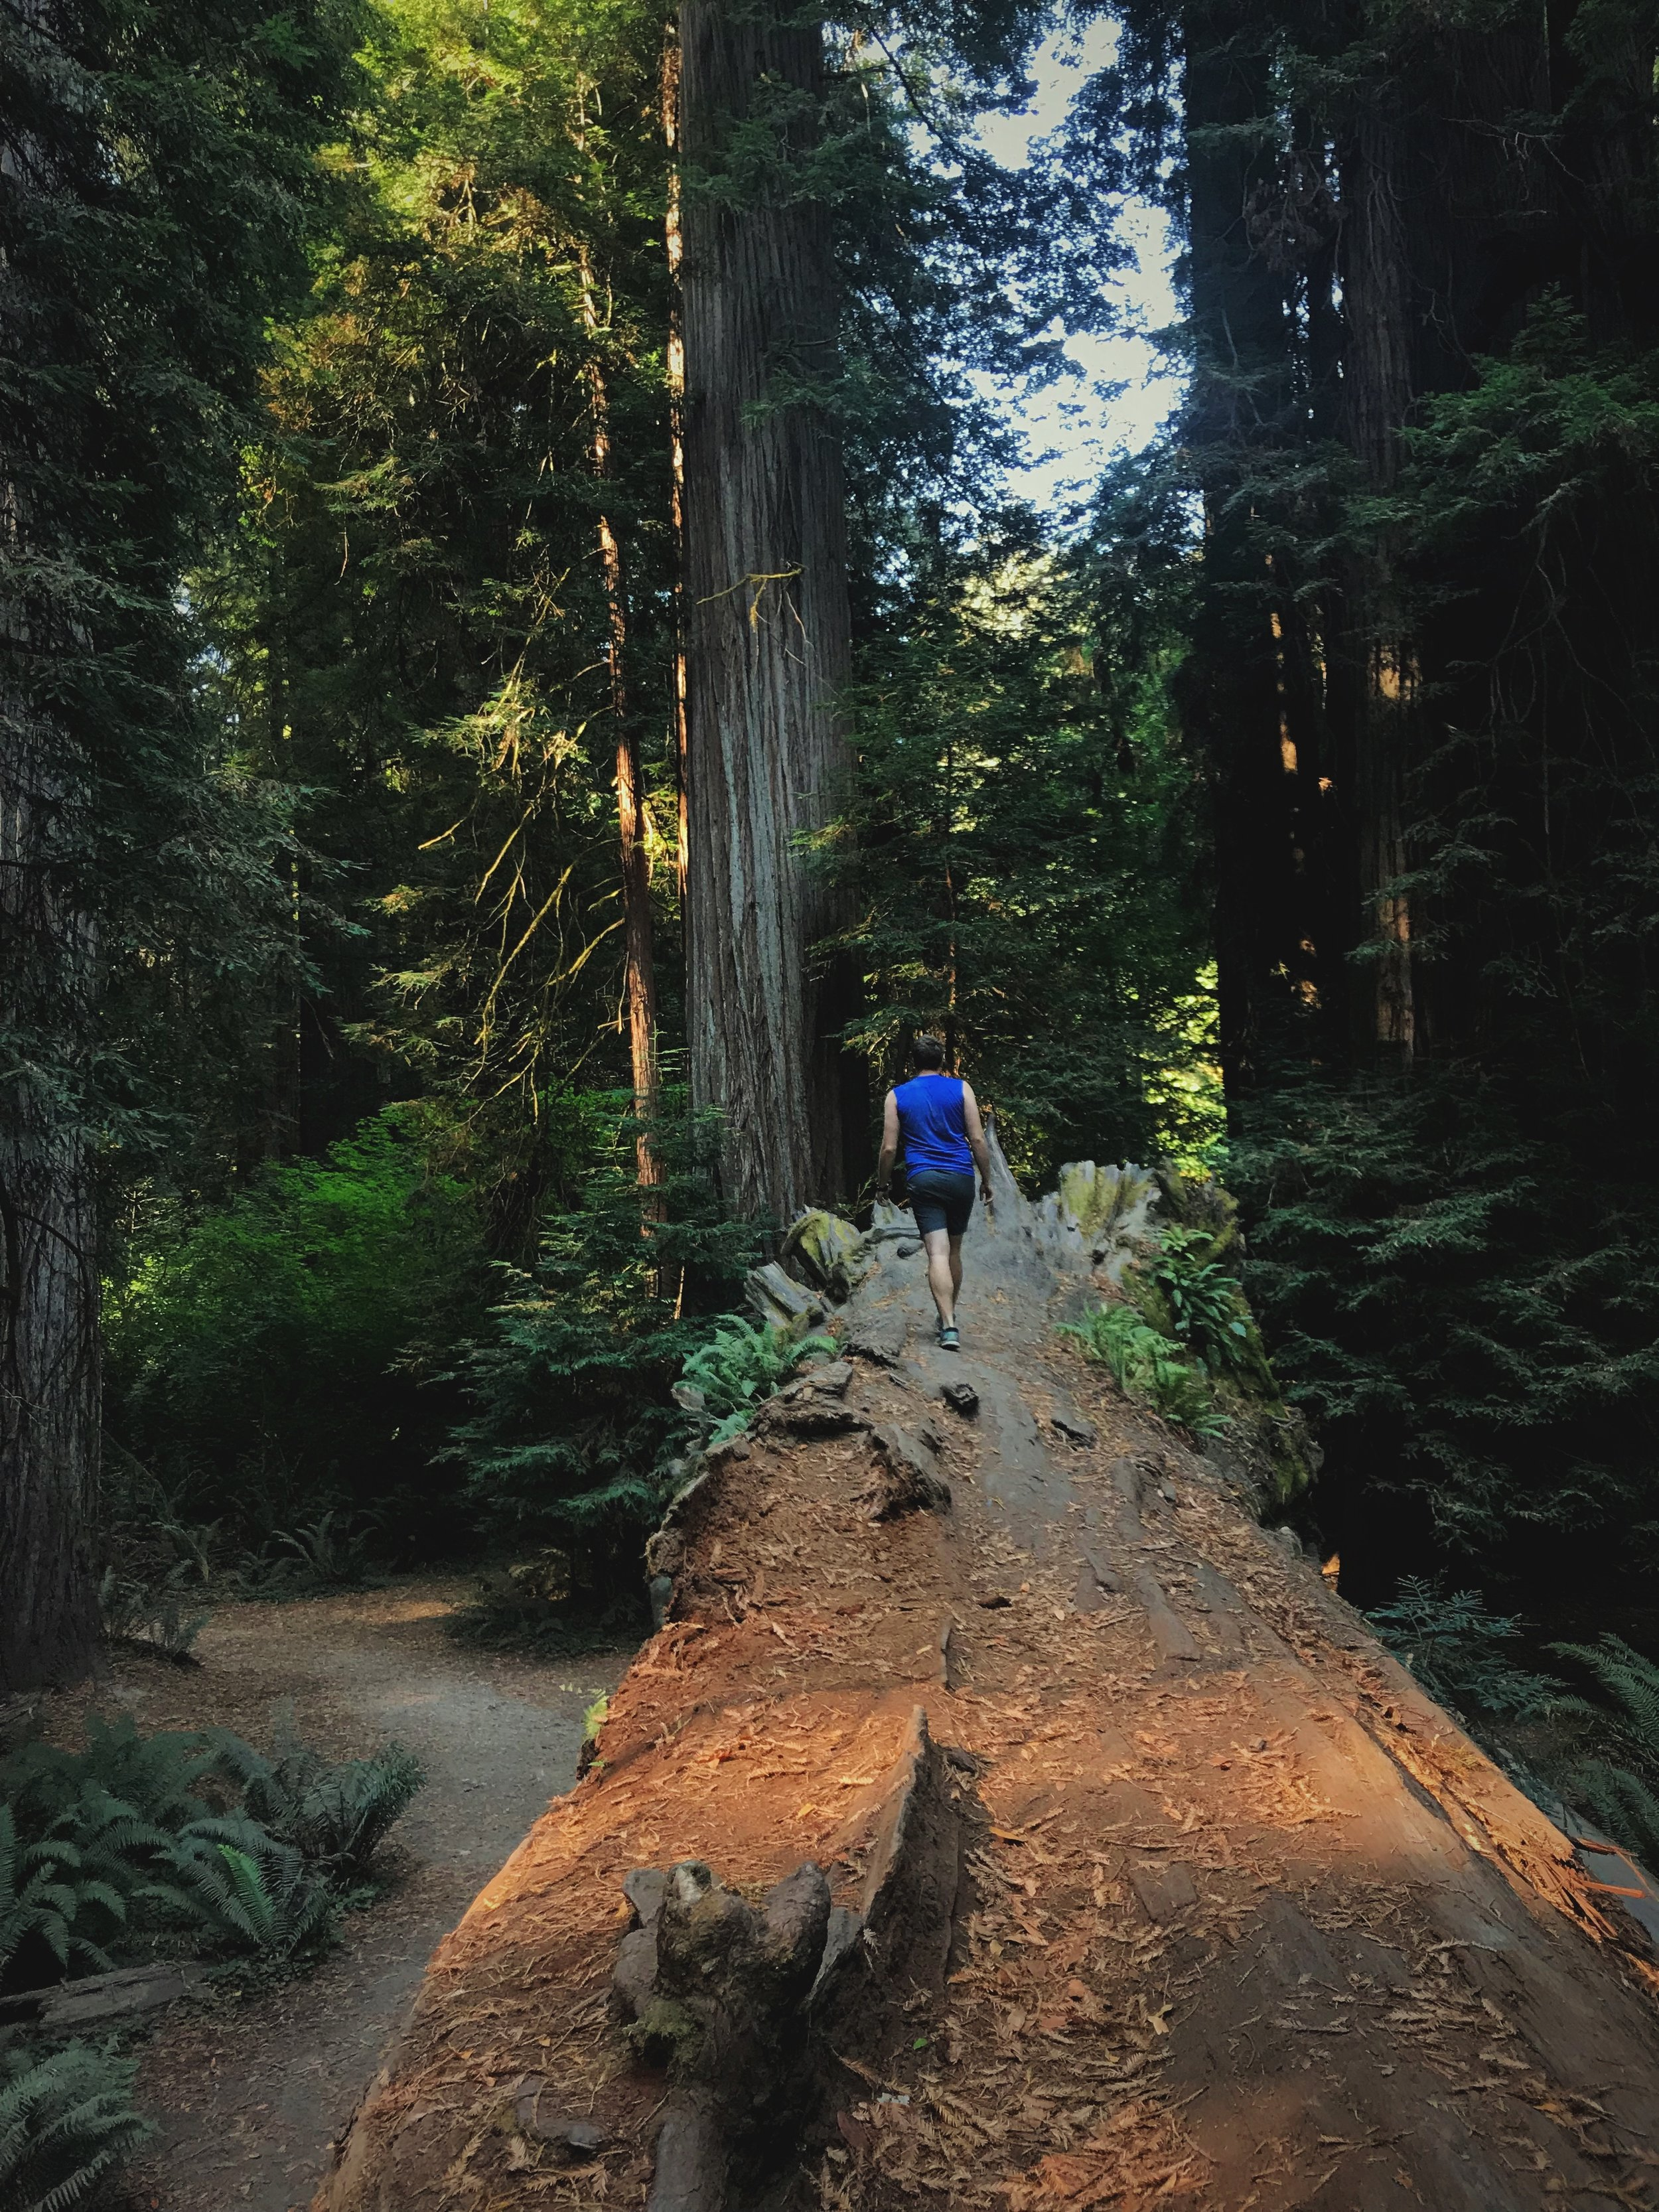 Ian walking along the length of a fallen tree.